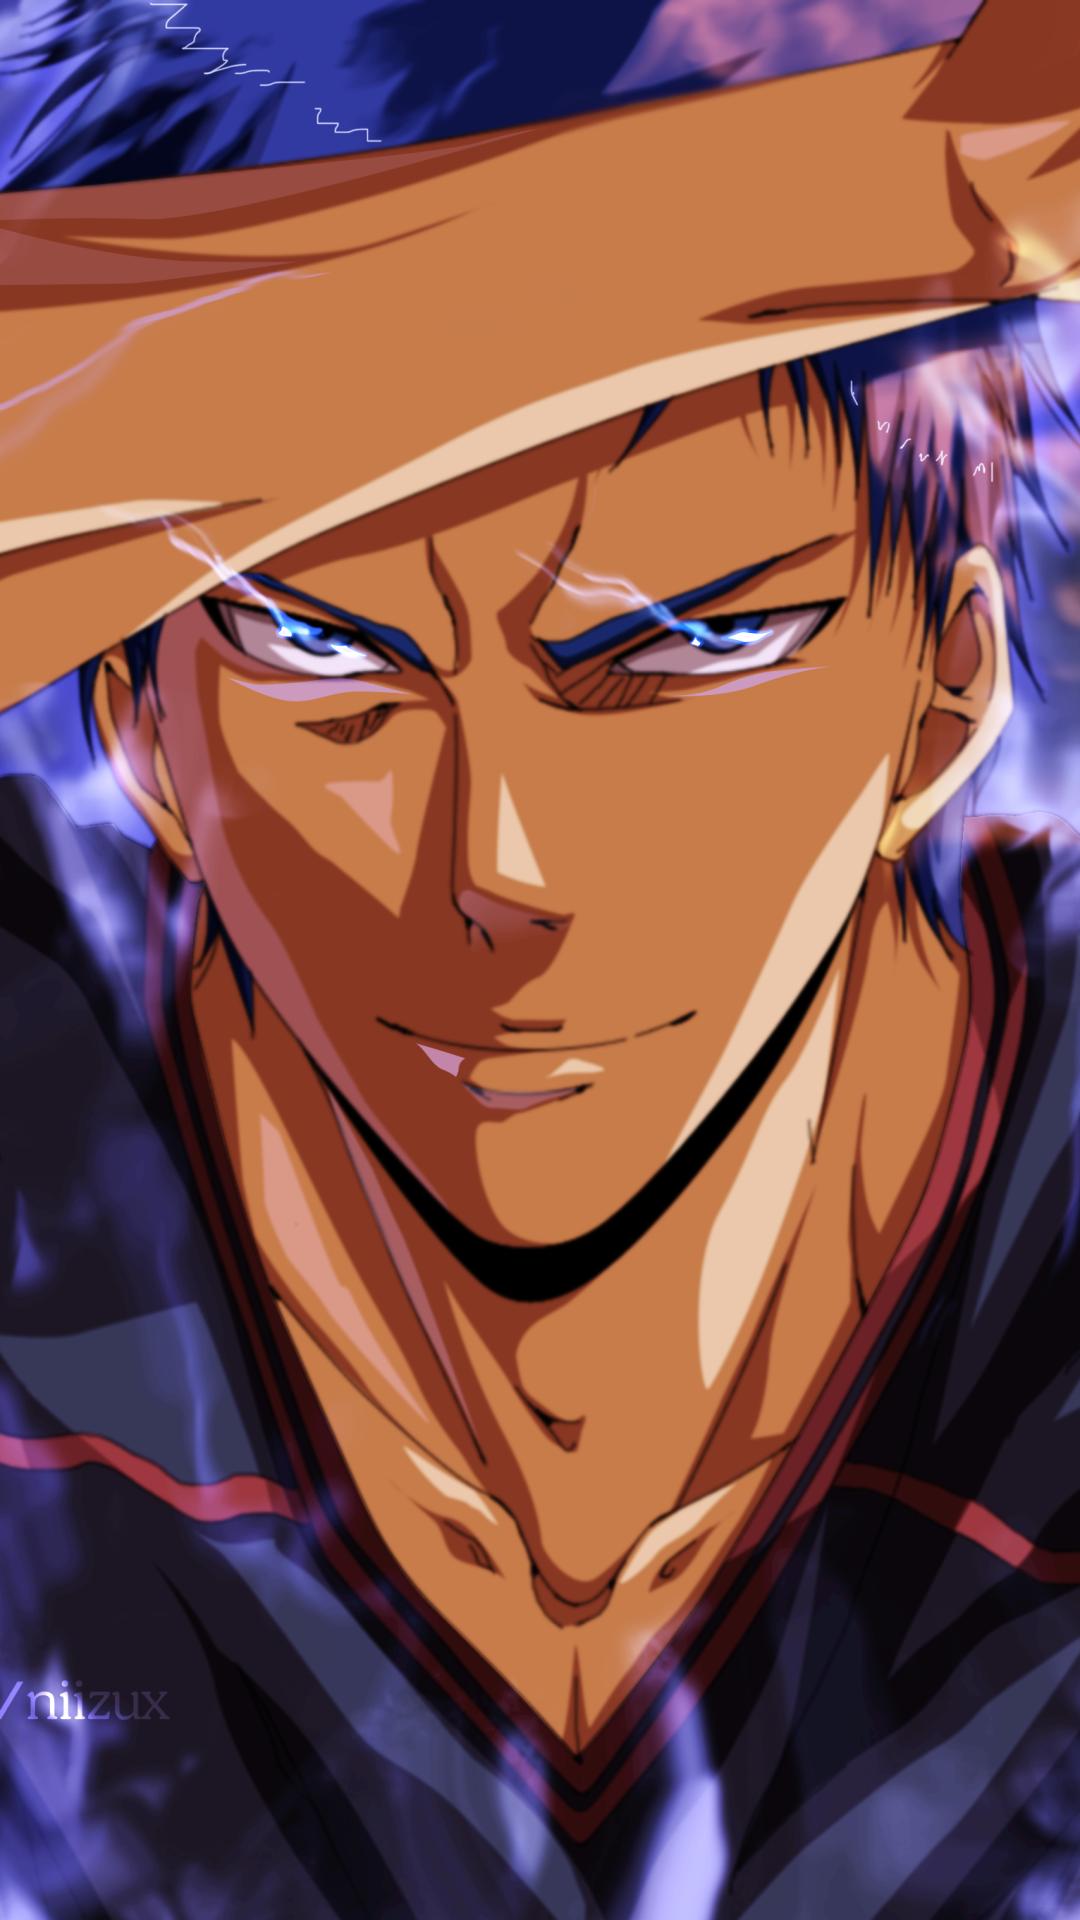 Anime Kuroko S Basketball 1080x1920 Mobile Wallpaper Fotografii Profilya Oboi Knizhnye Postery